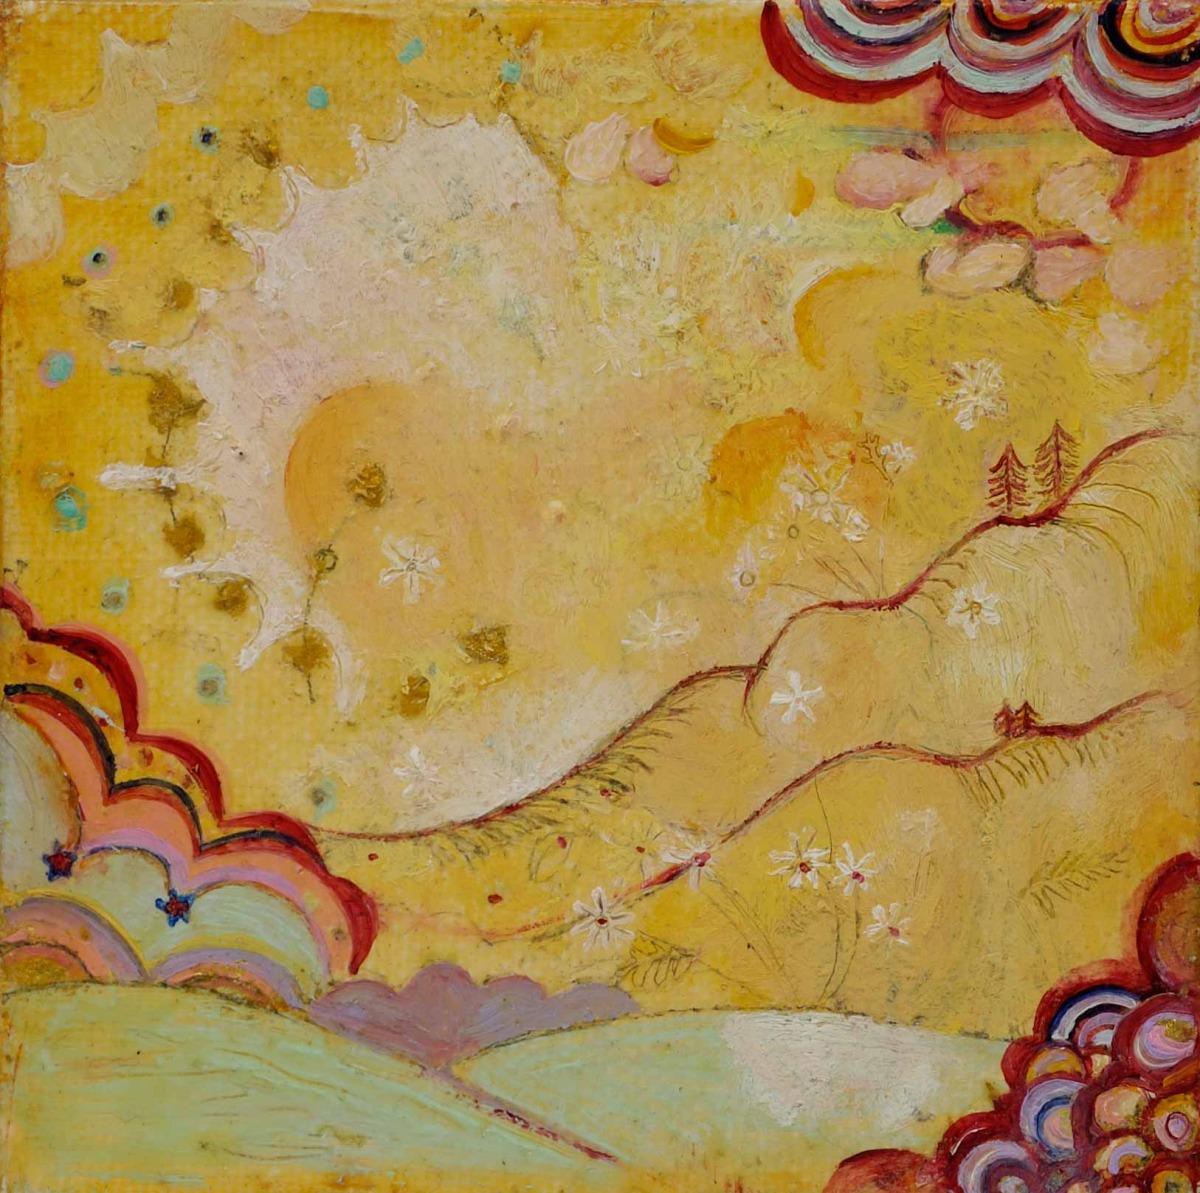 "Mountain Illumination Oil, graphite, gold leaf on canvas 4"" x 4"" / SOLD"